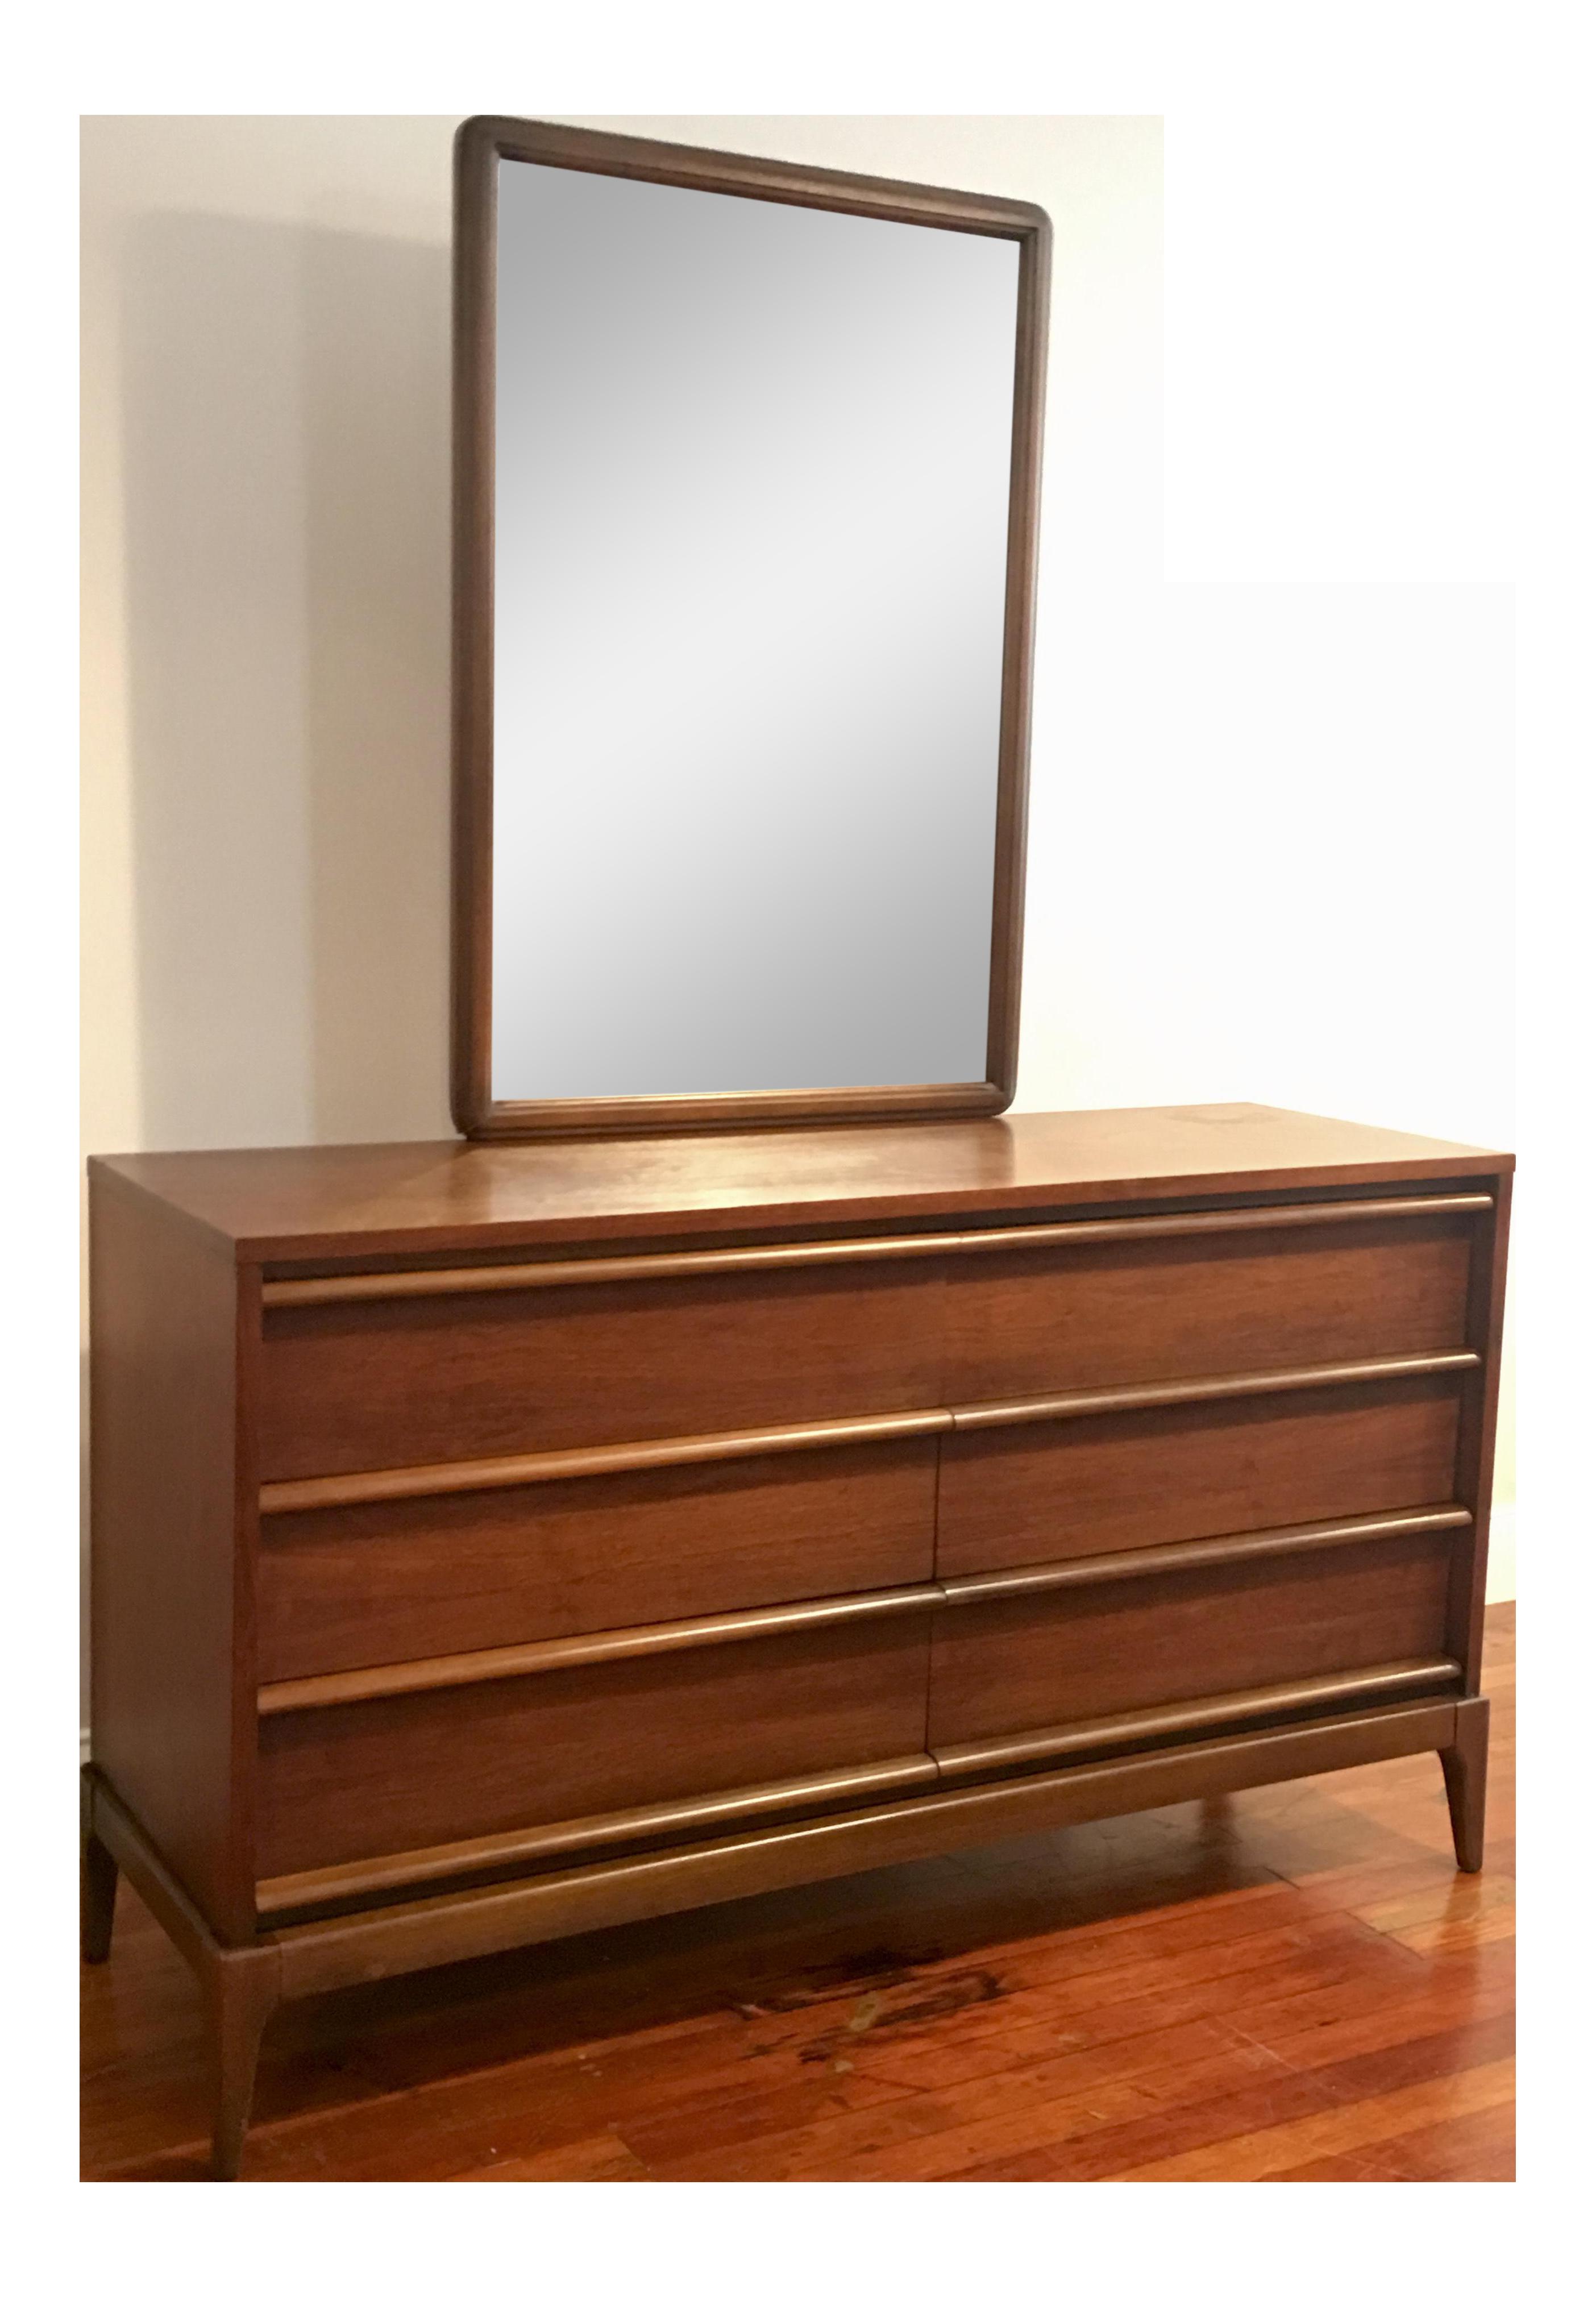 Lane furniture mid century modern rhythm 6 drawer long dresser mirror chairish